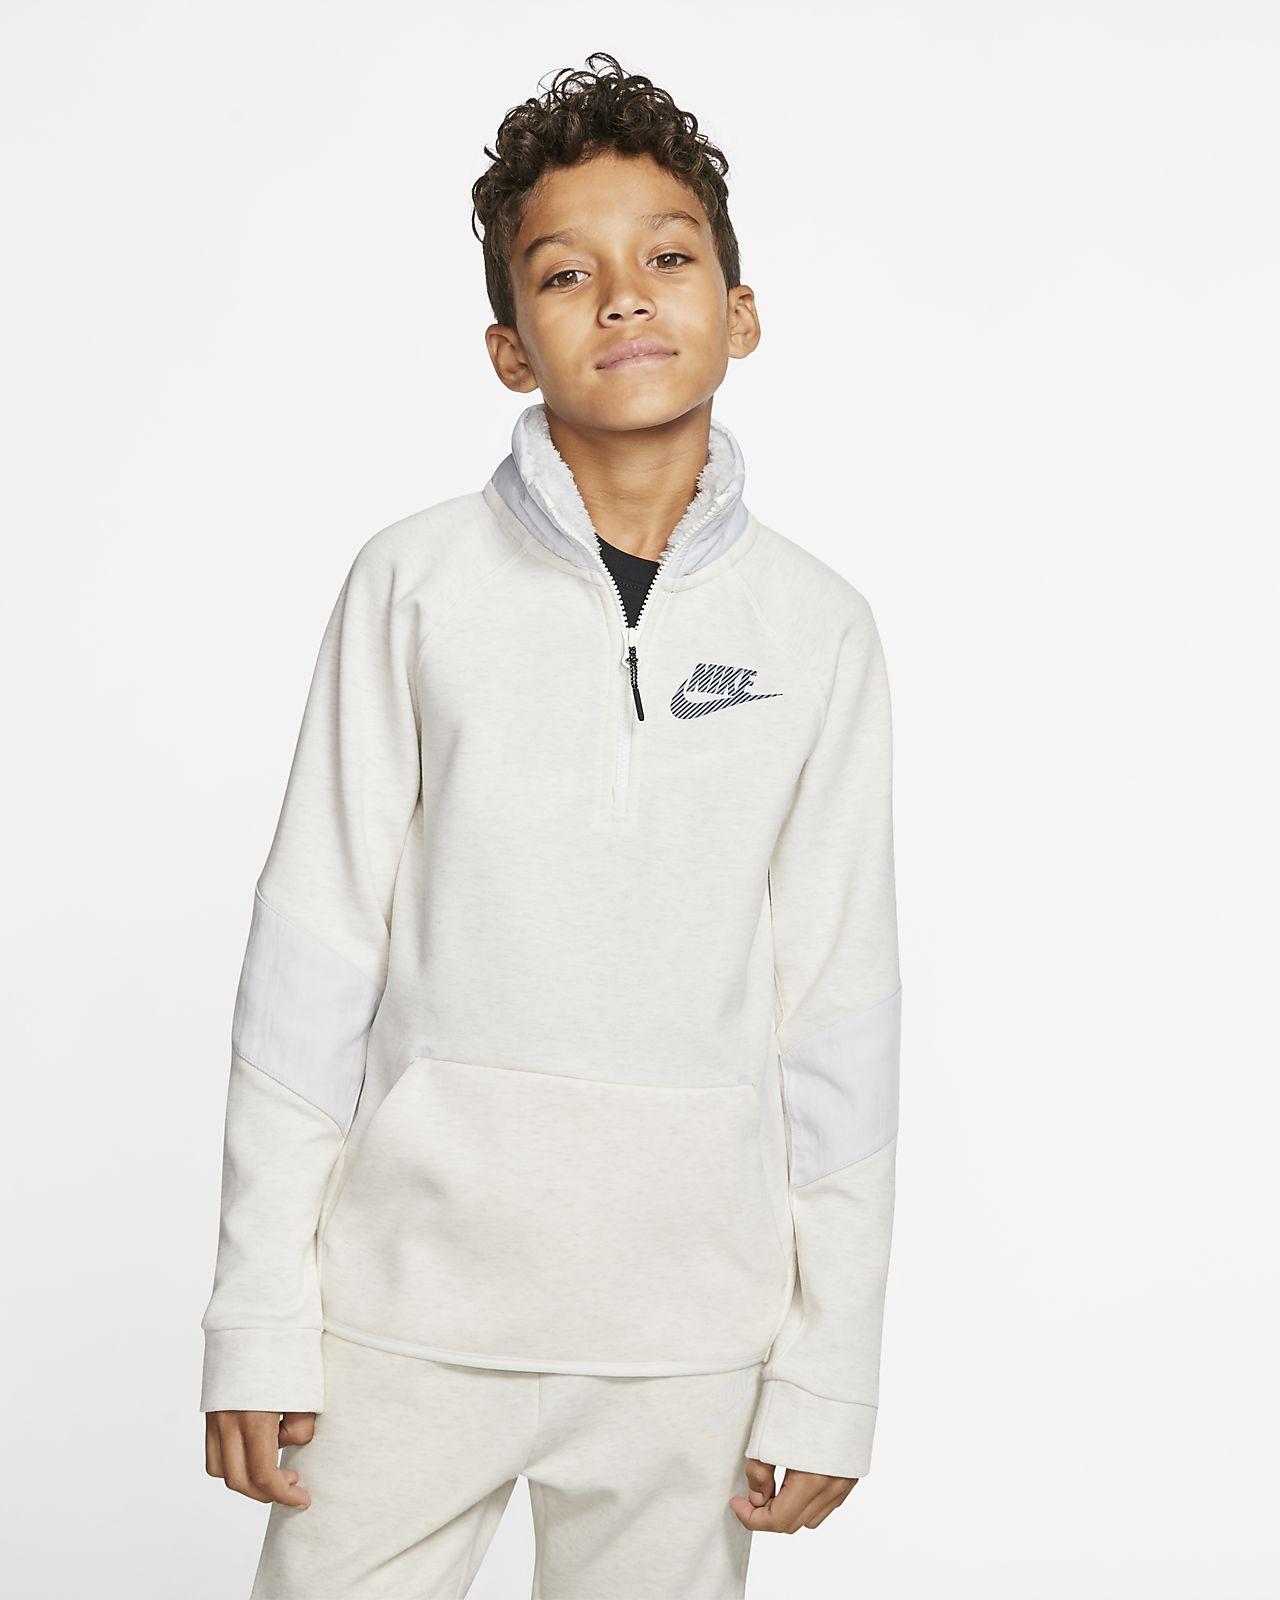 Nike Sportswear Winterized Tech Fleece Part superior de màniga llarga - Nen/a